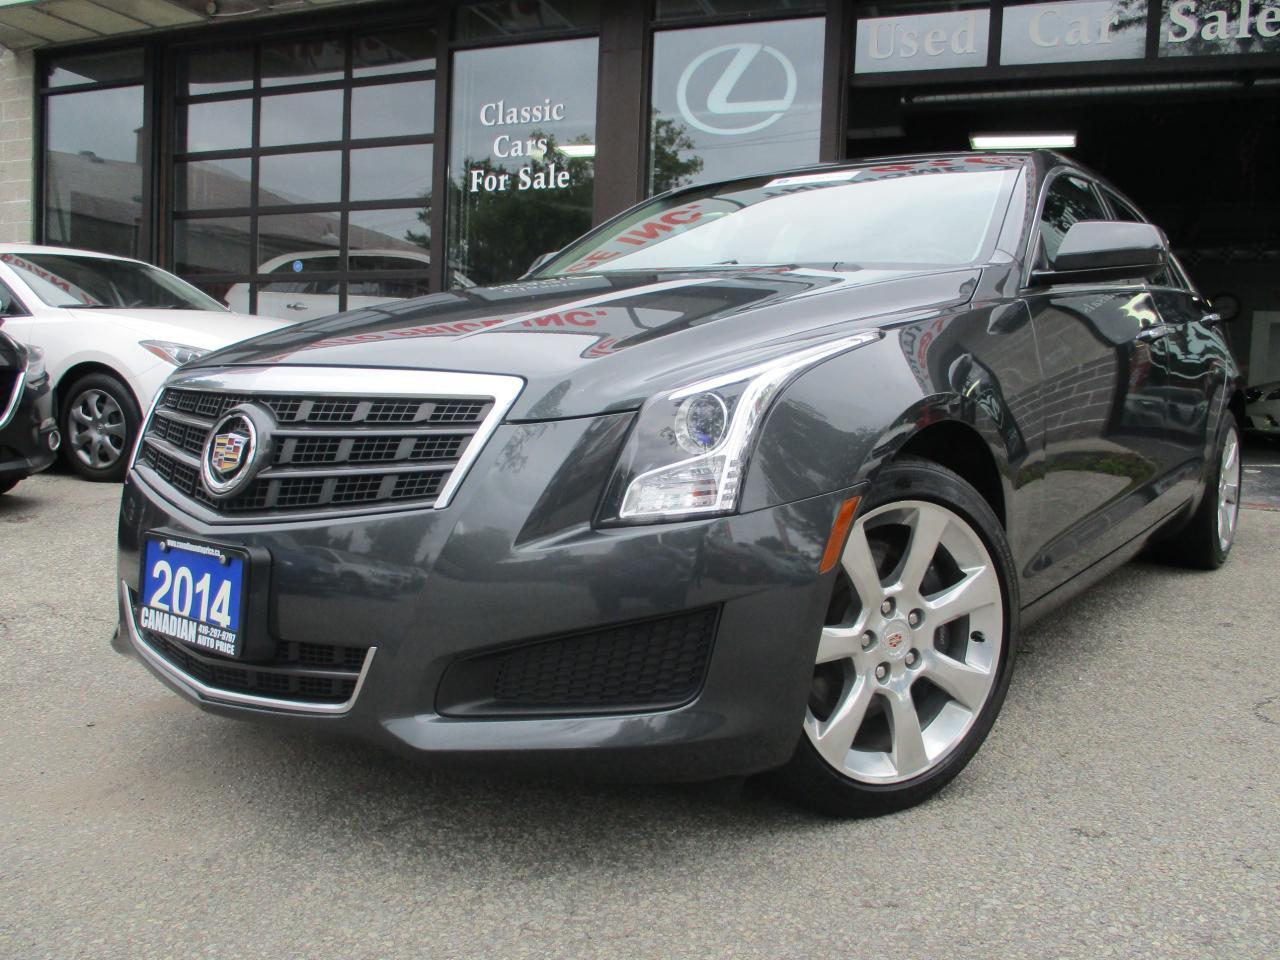 Used 2014 Cadillac Ats Awd 2 0l Turbo Awd Prm Pkg Sunroof Loaded For